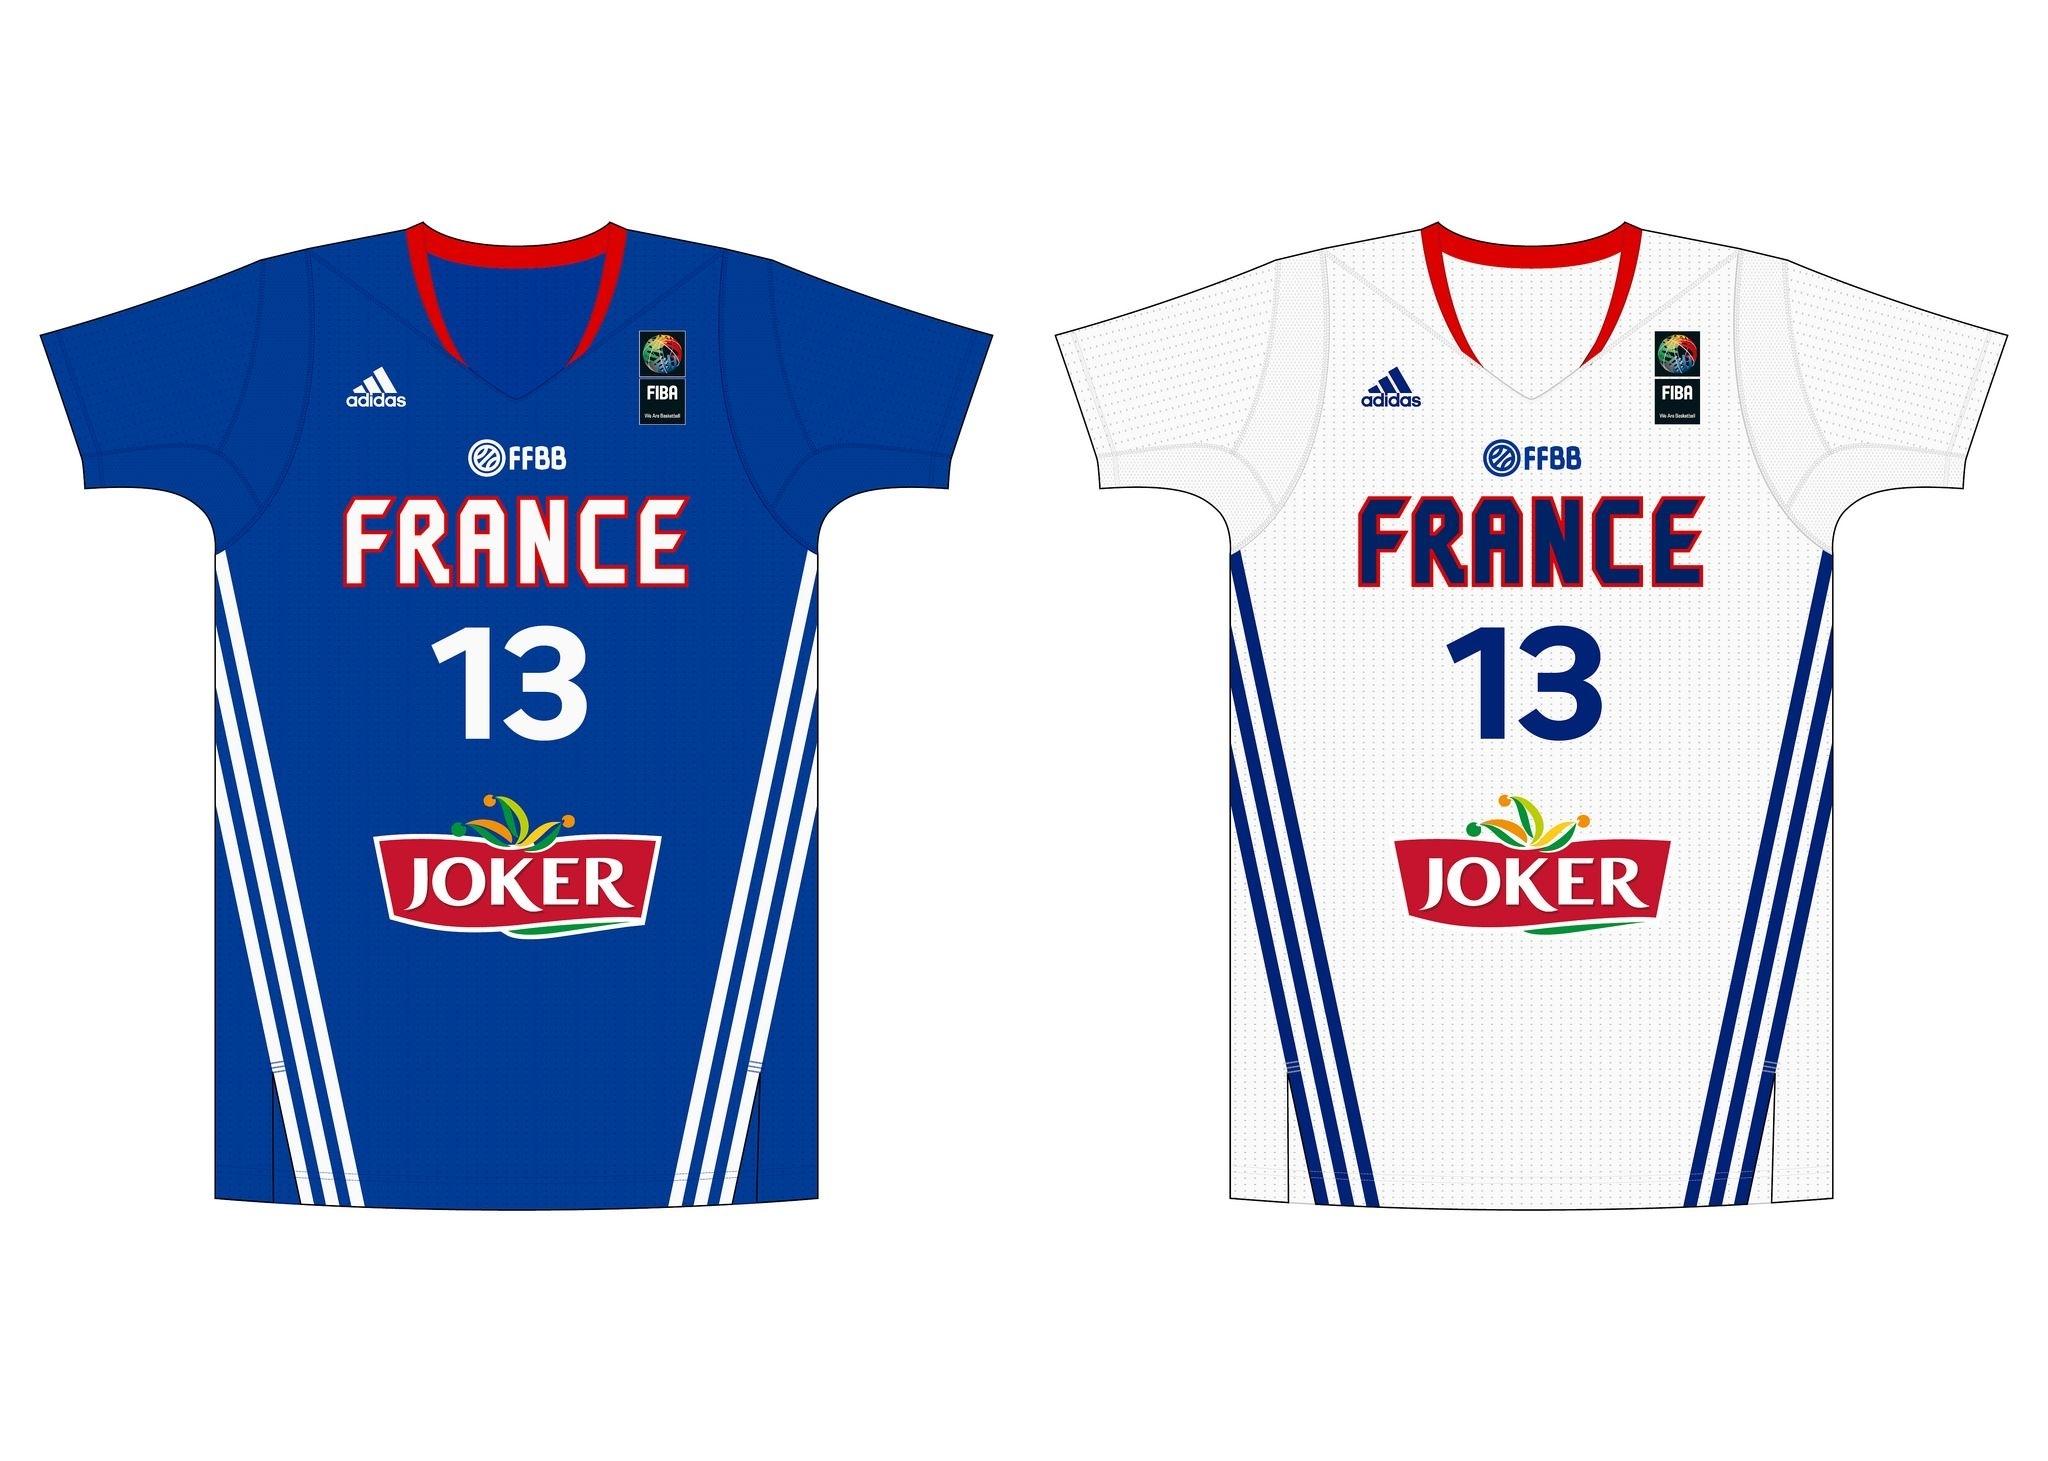 france national team jersey (fiba world championship 2014, spain